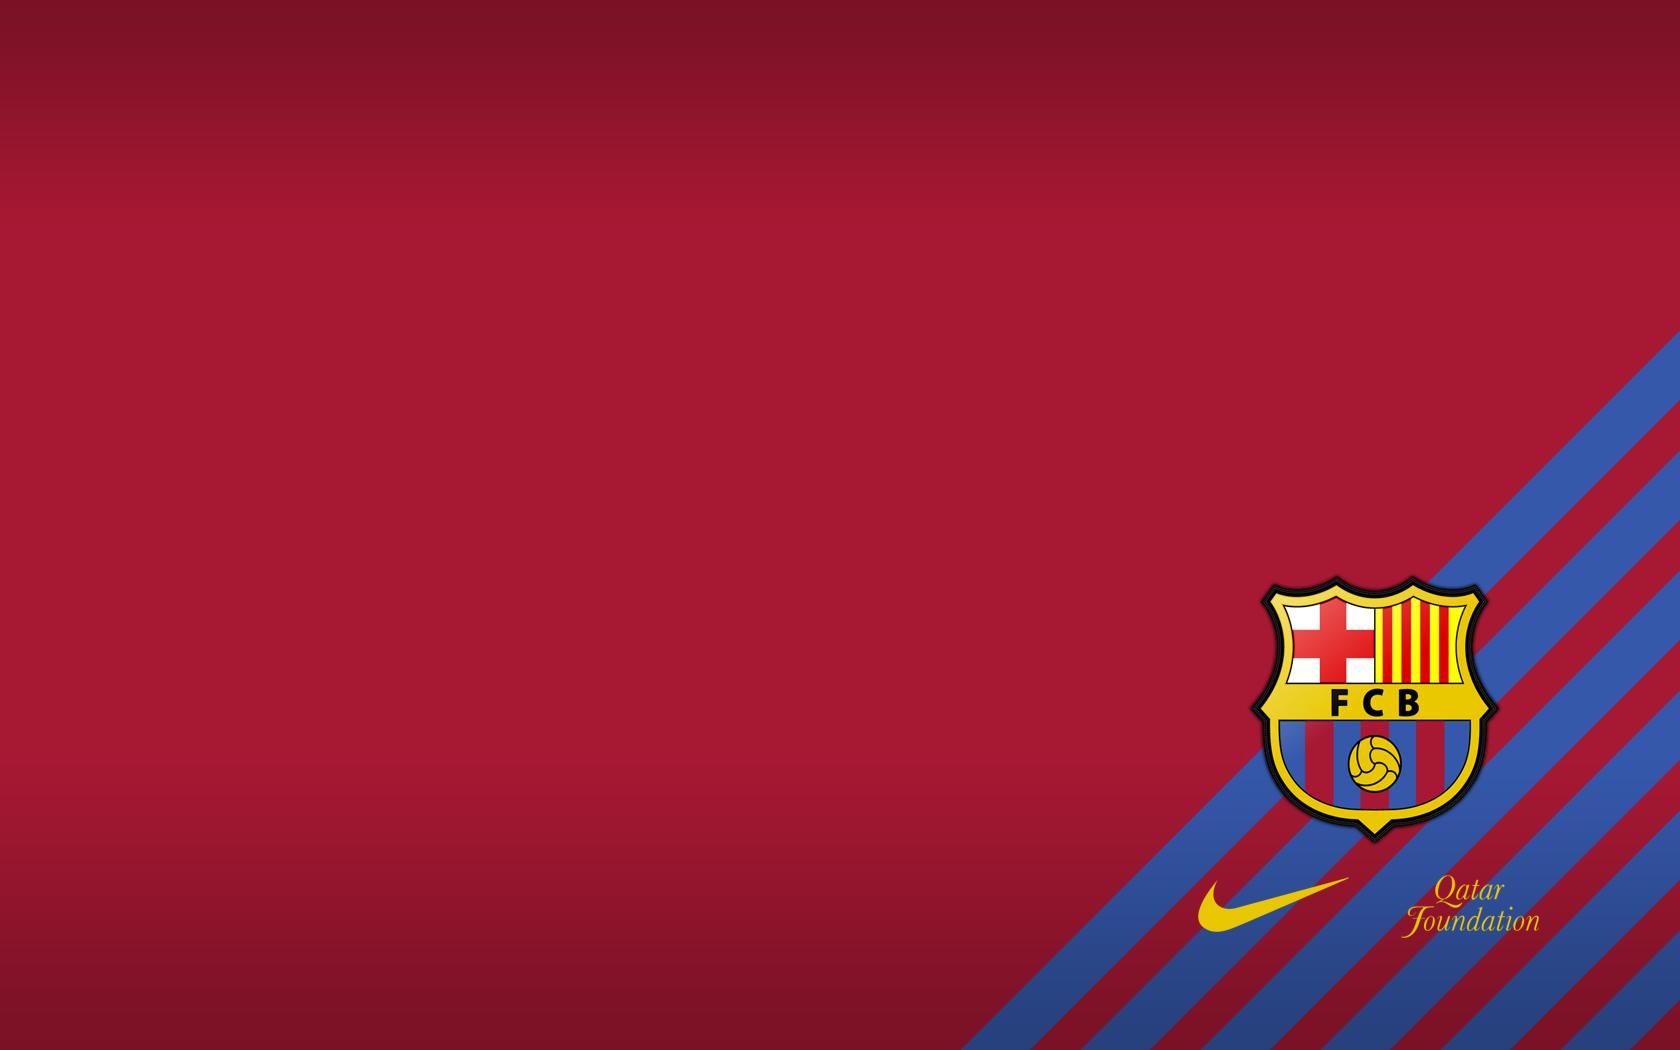 Fc Barcelona Wallpaper By Vkkk Dyatz 1680x1050 pixel Football HD 1680x1050